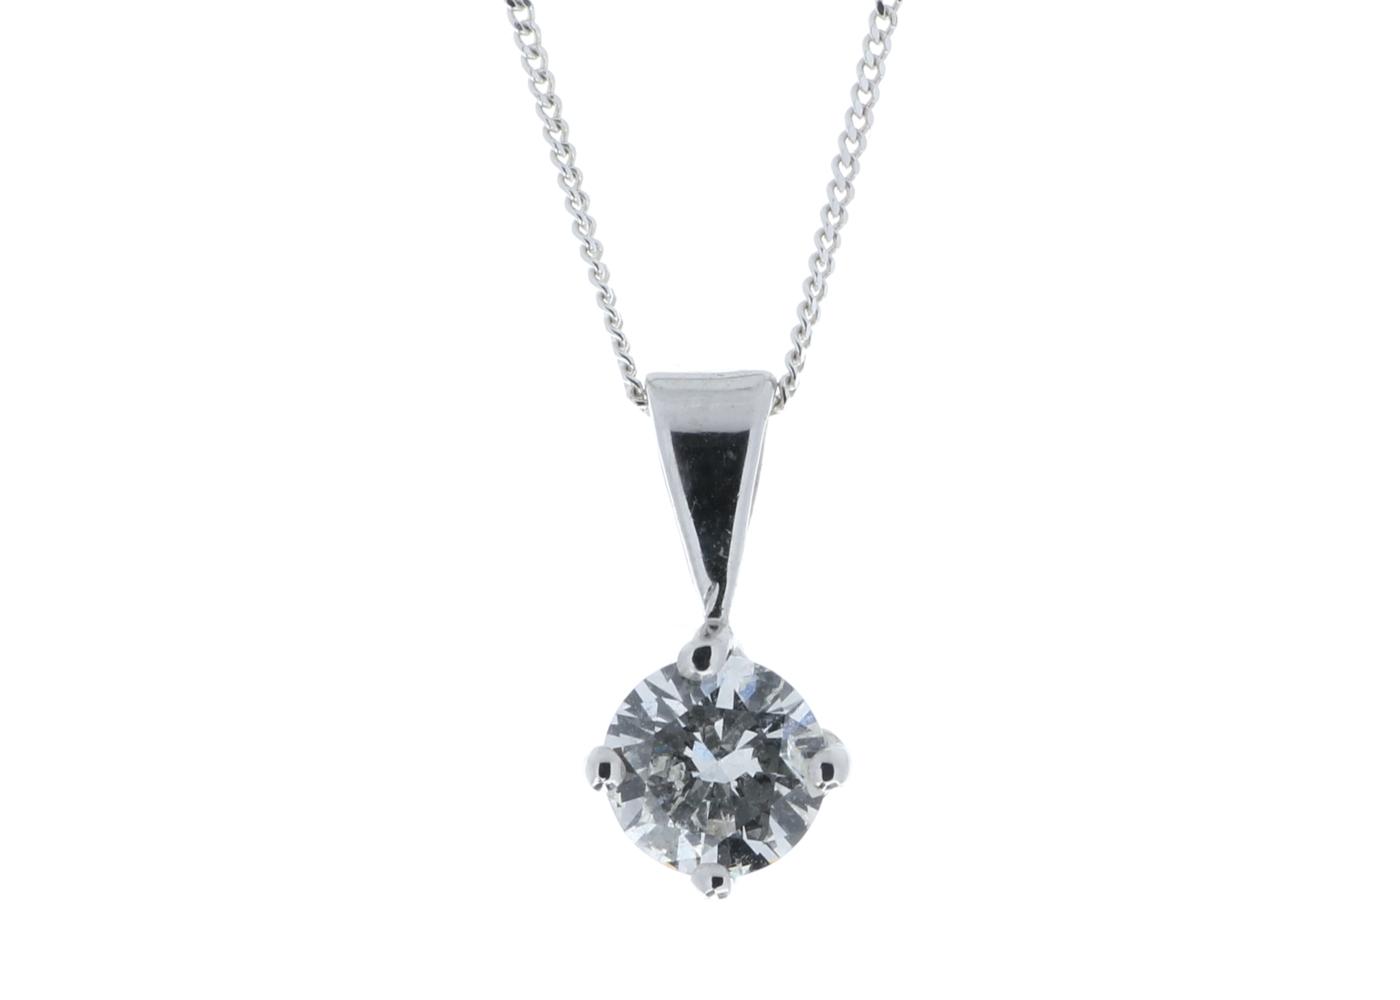 Lot 36 - 18ct White Gold Wire Set Diamond Pendant 0.80 Carats